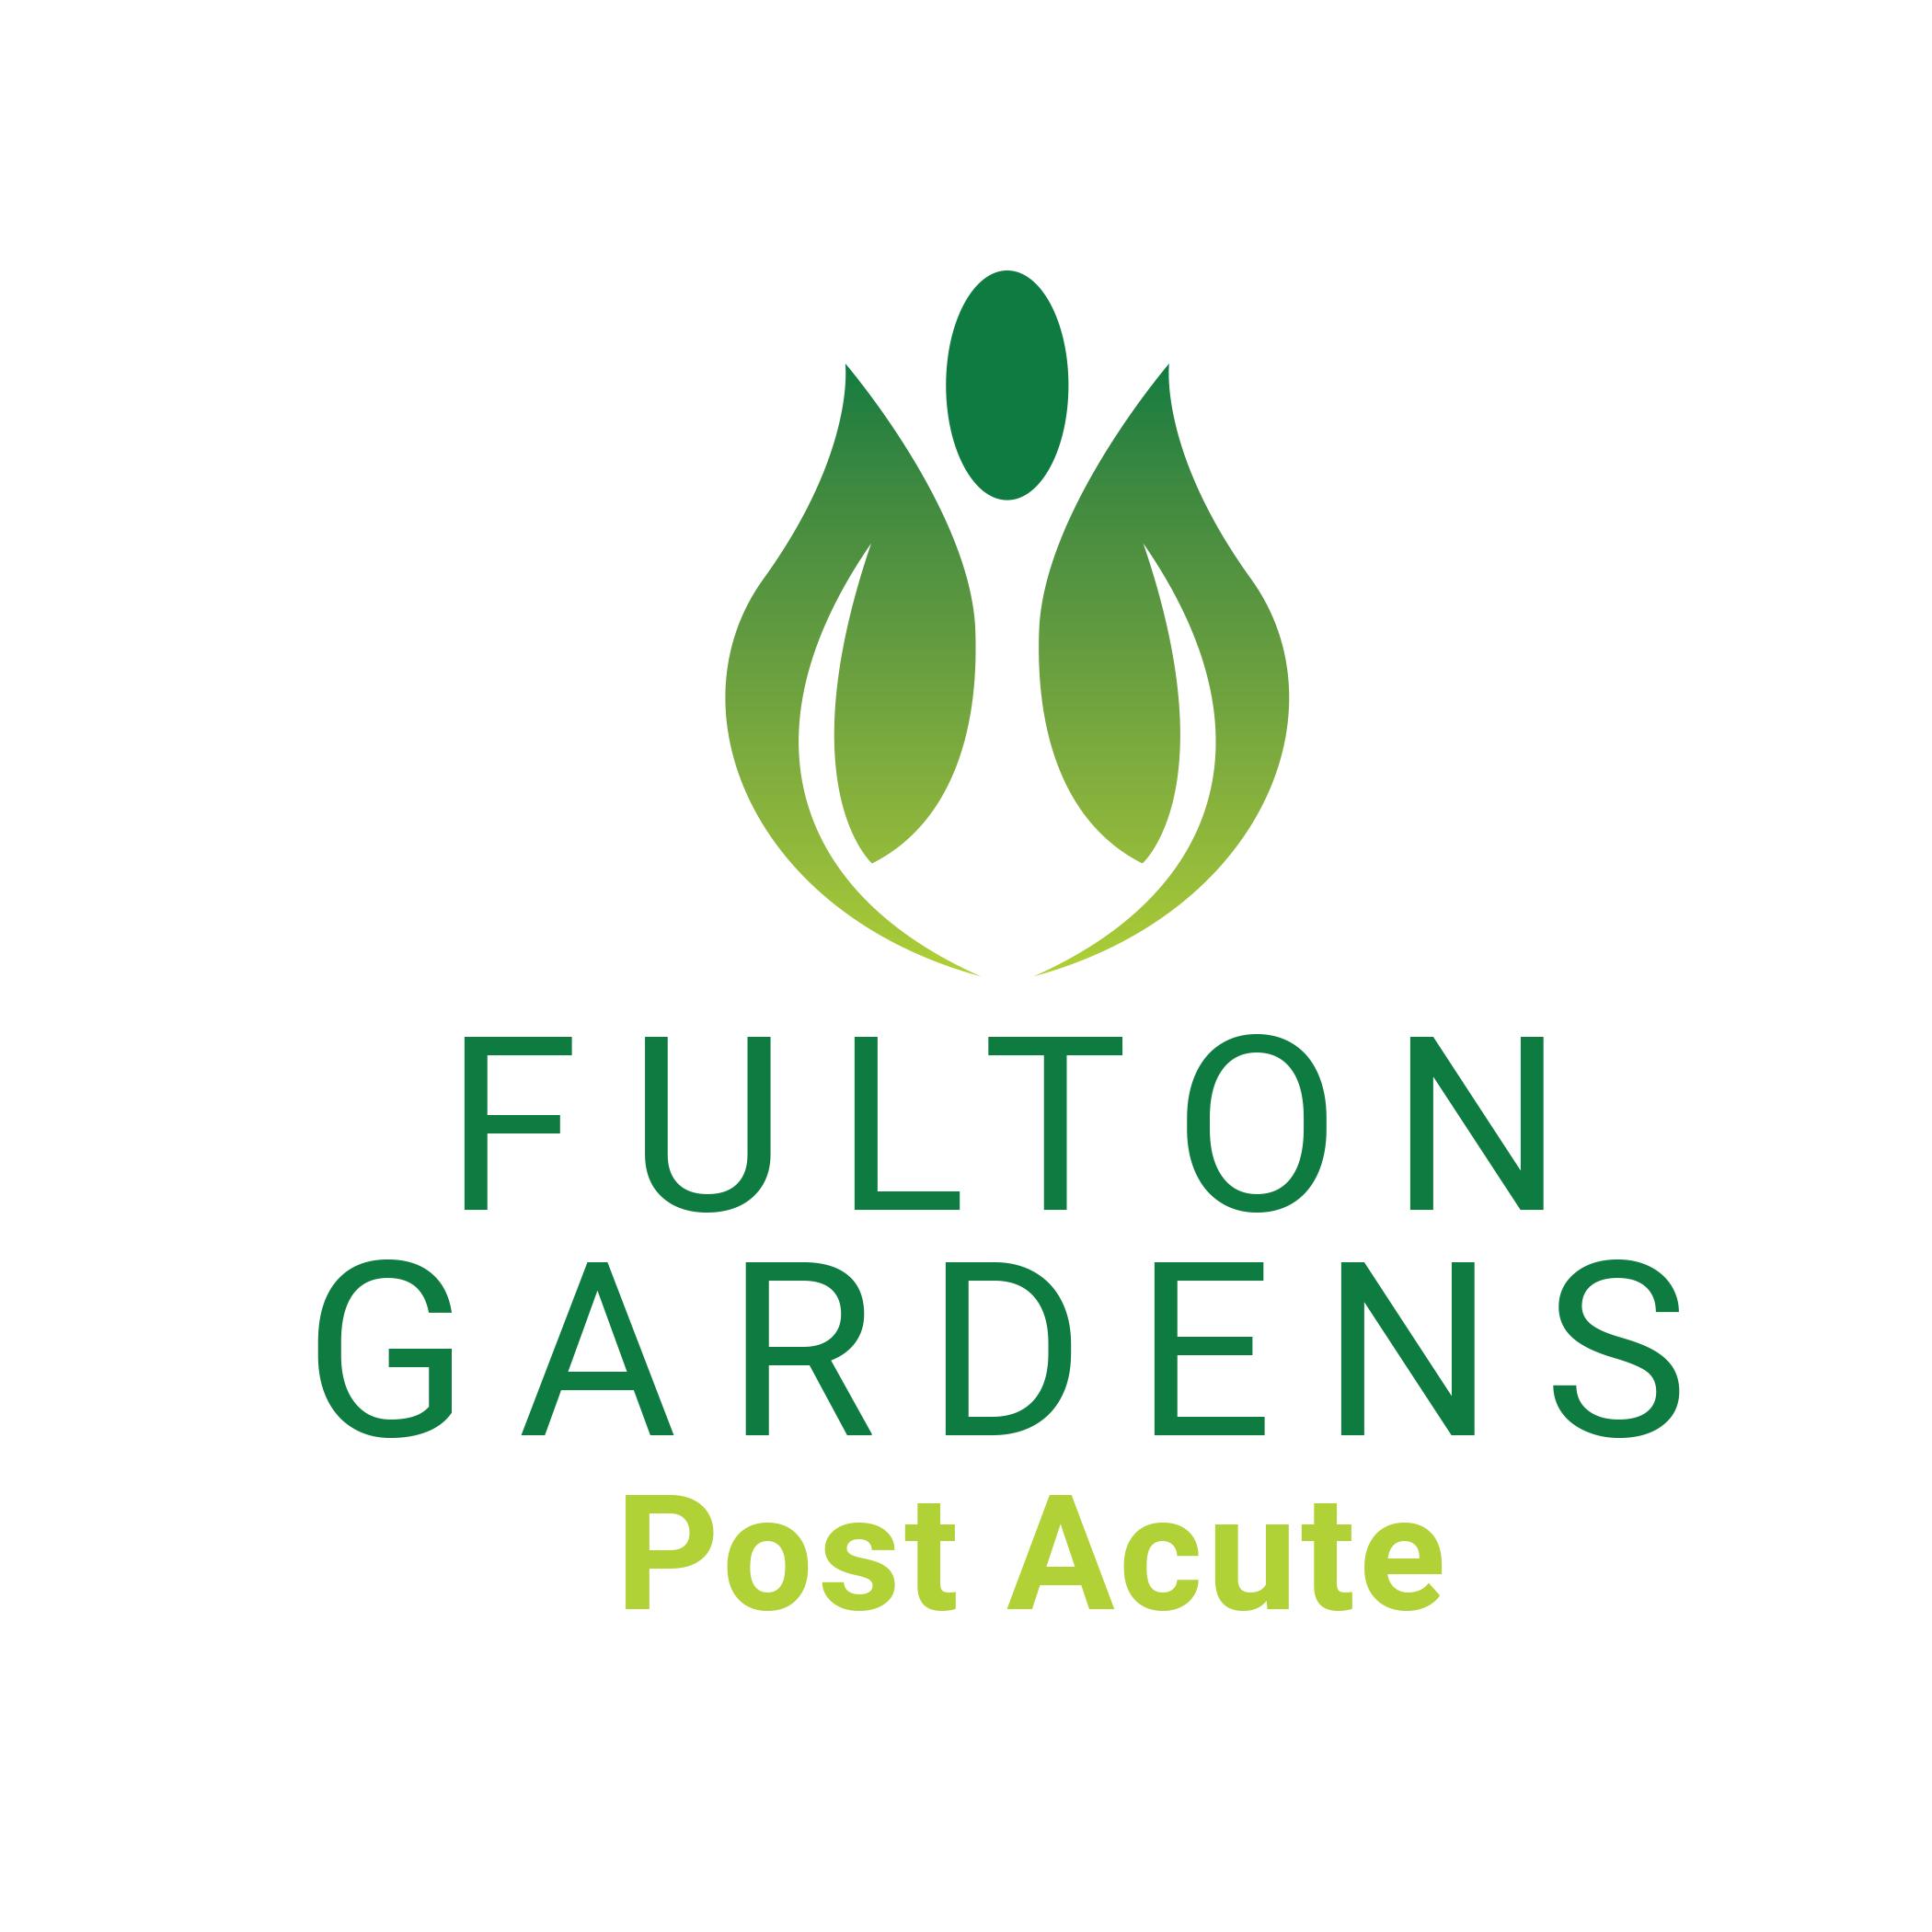 Fulton Gardens Post Acute - Stockton, CA 95204 - (209)466-2066 | ShowMeLocal.com